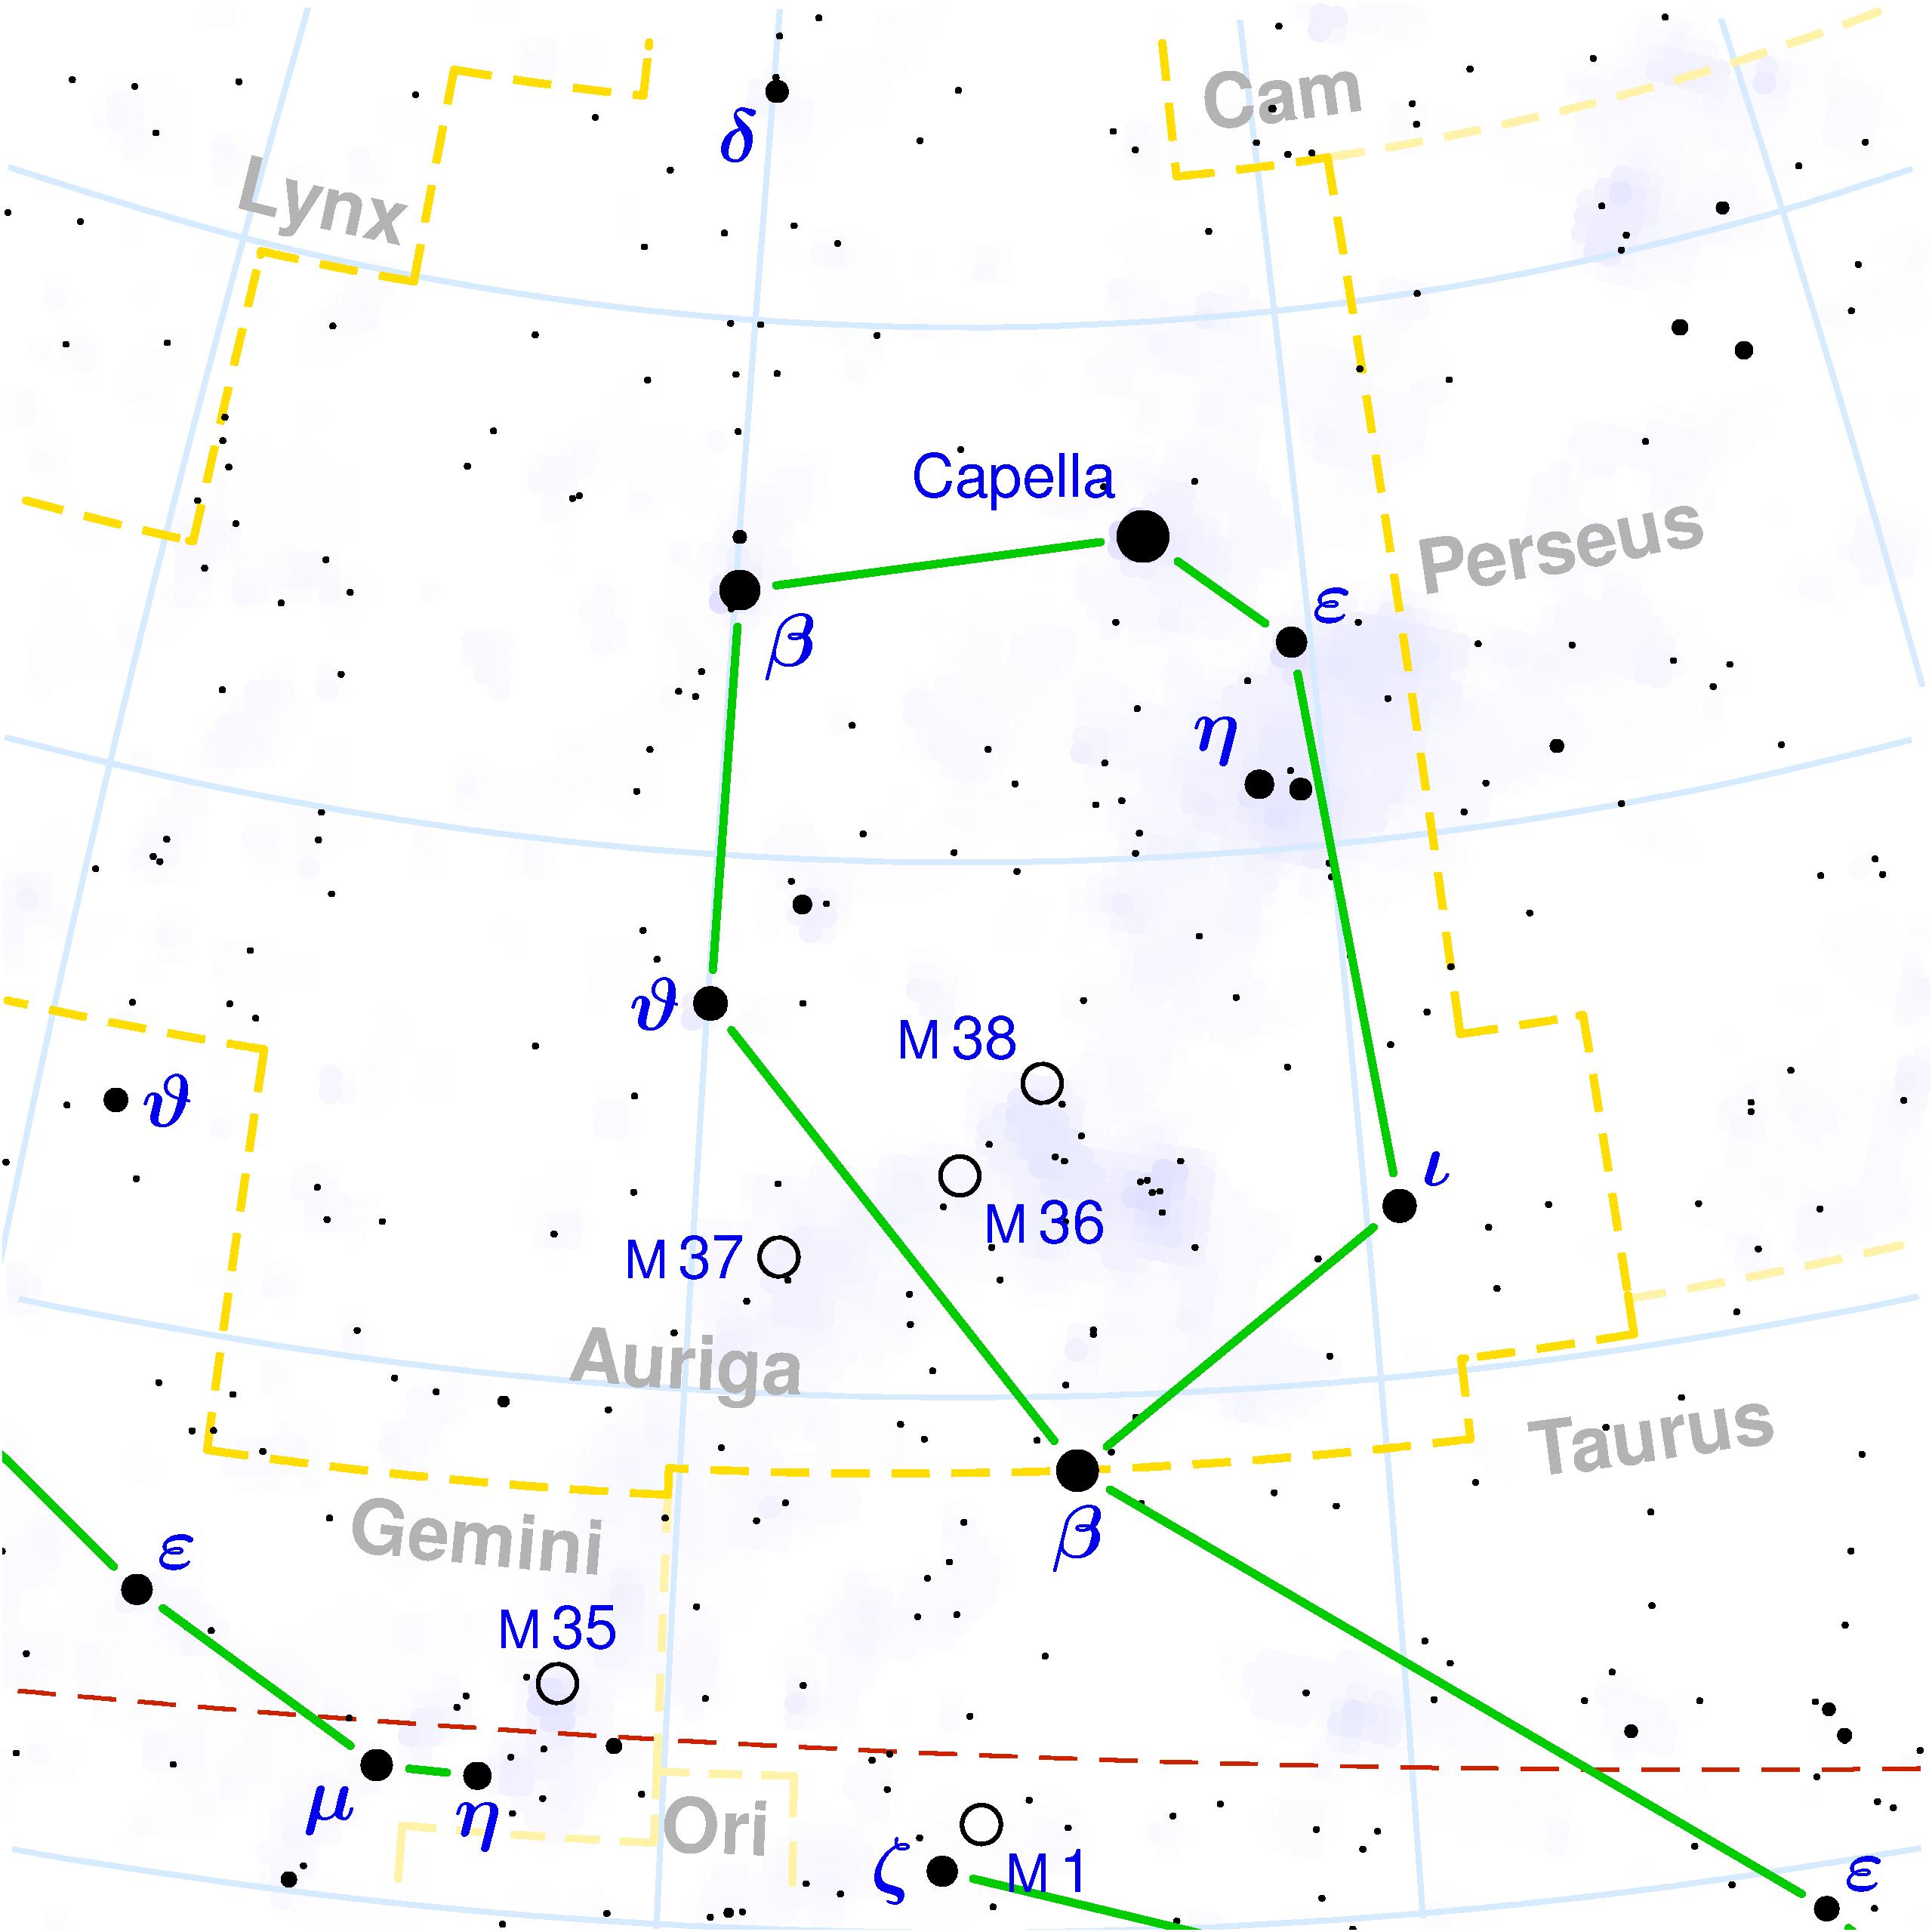 Auriga_constellation_map - Ngôi sao Capella